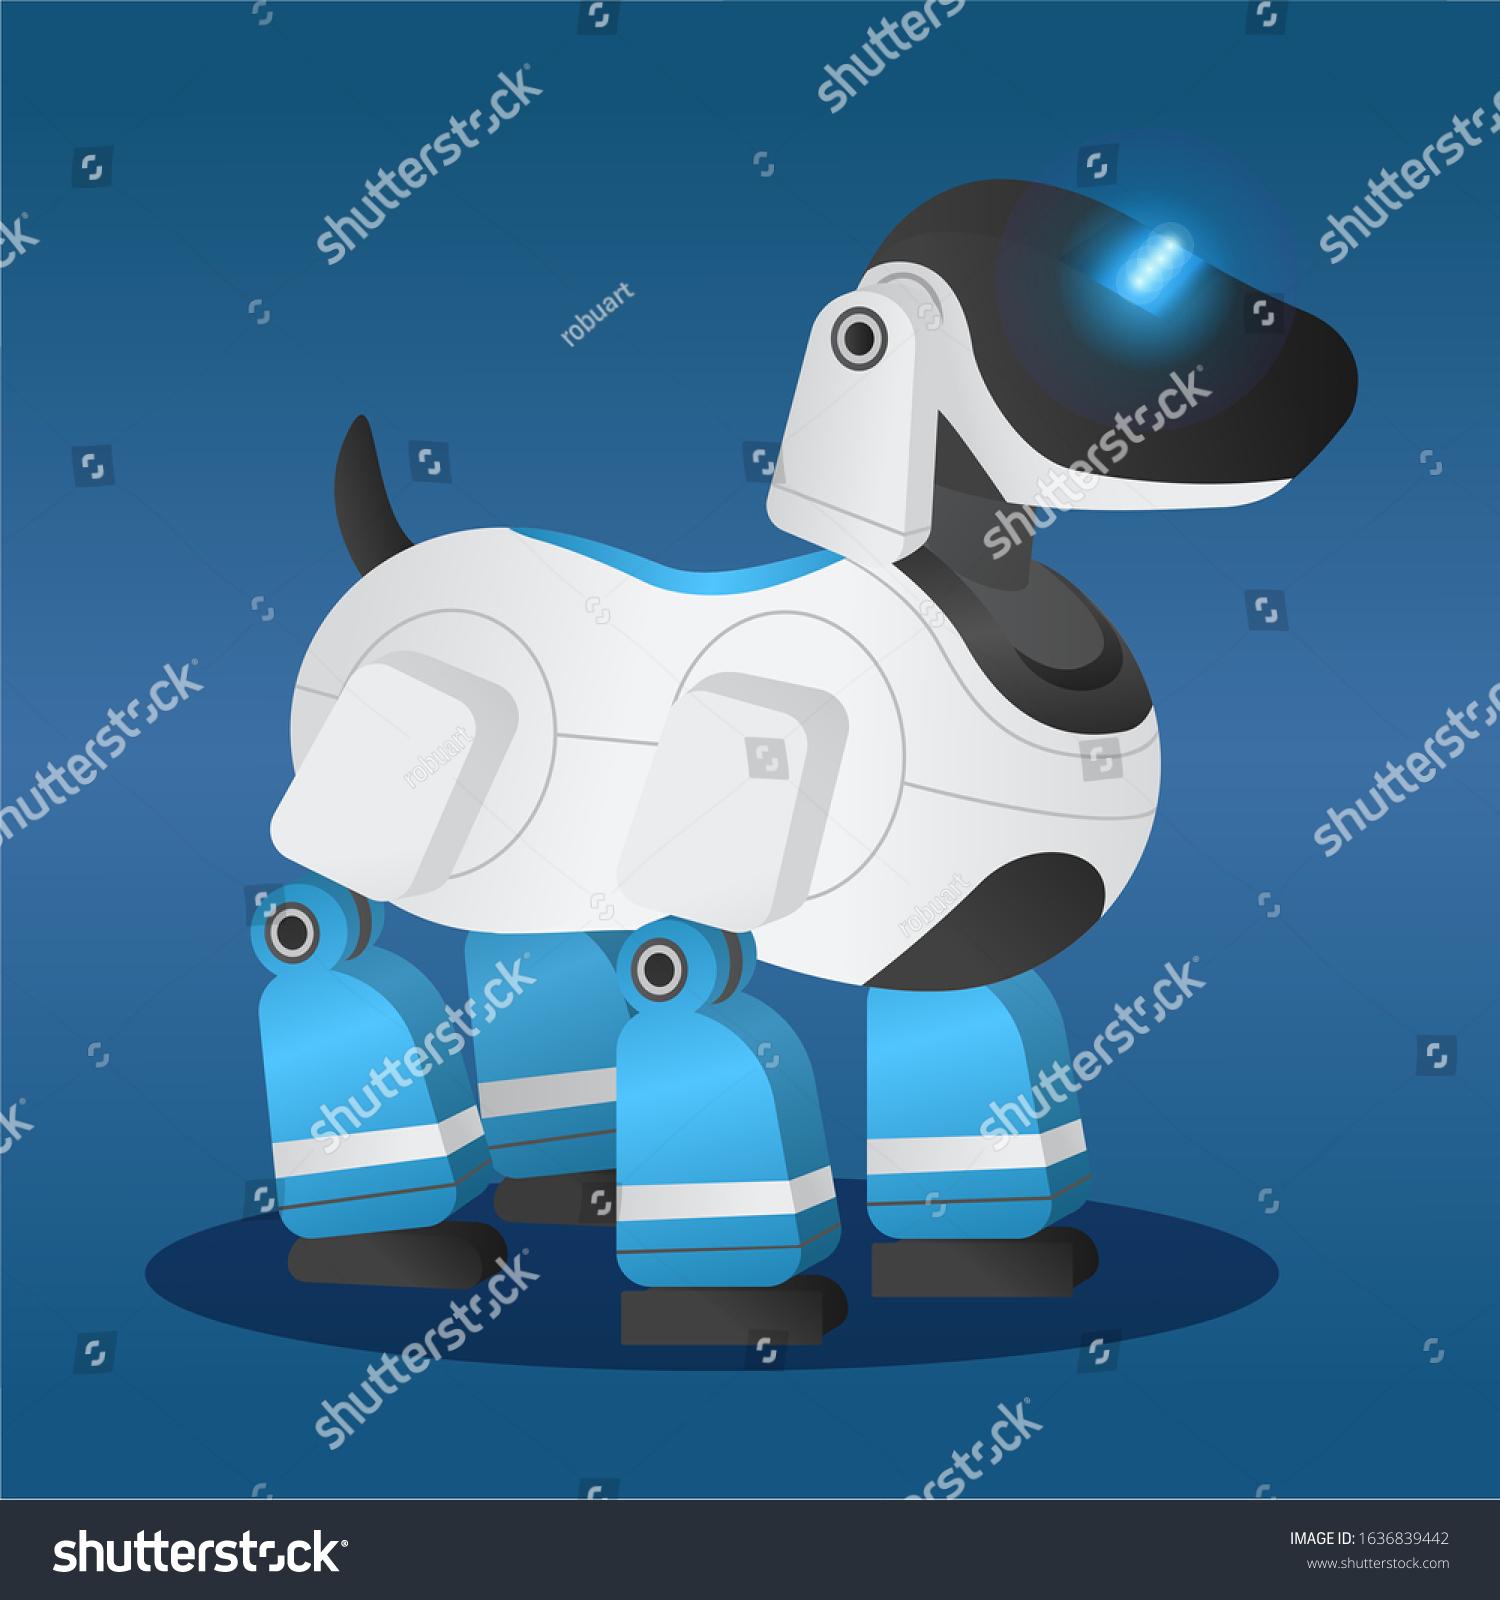 Robotic Dog Innovative Robot Model Futuristic Stock Vector ...